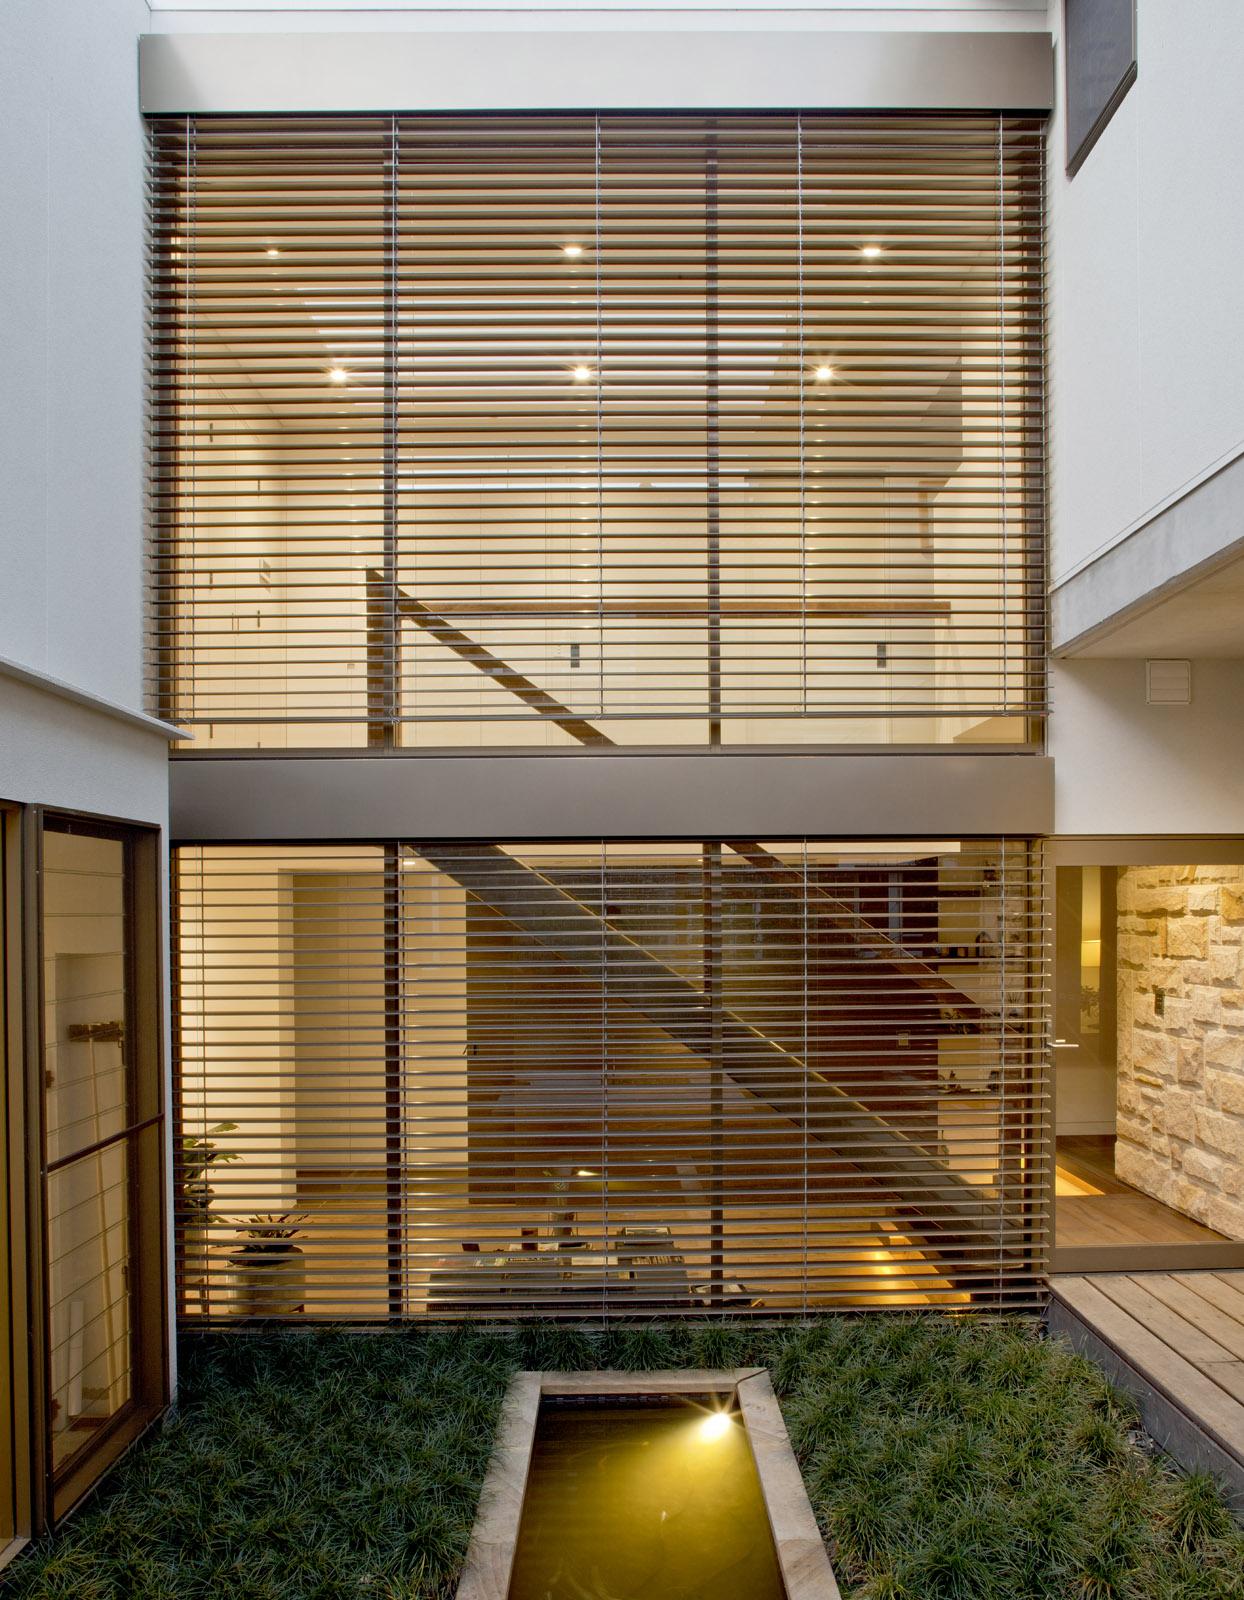 SWP_SRAI-CONCORD HOUSE_IMG_5232.jpg